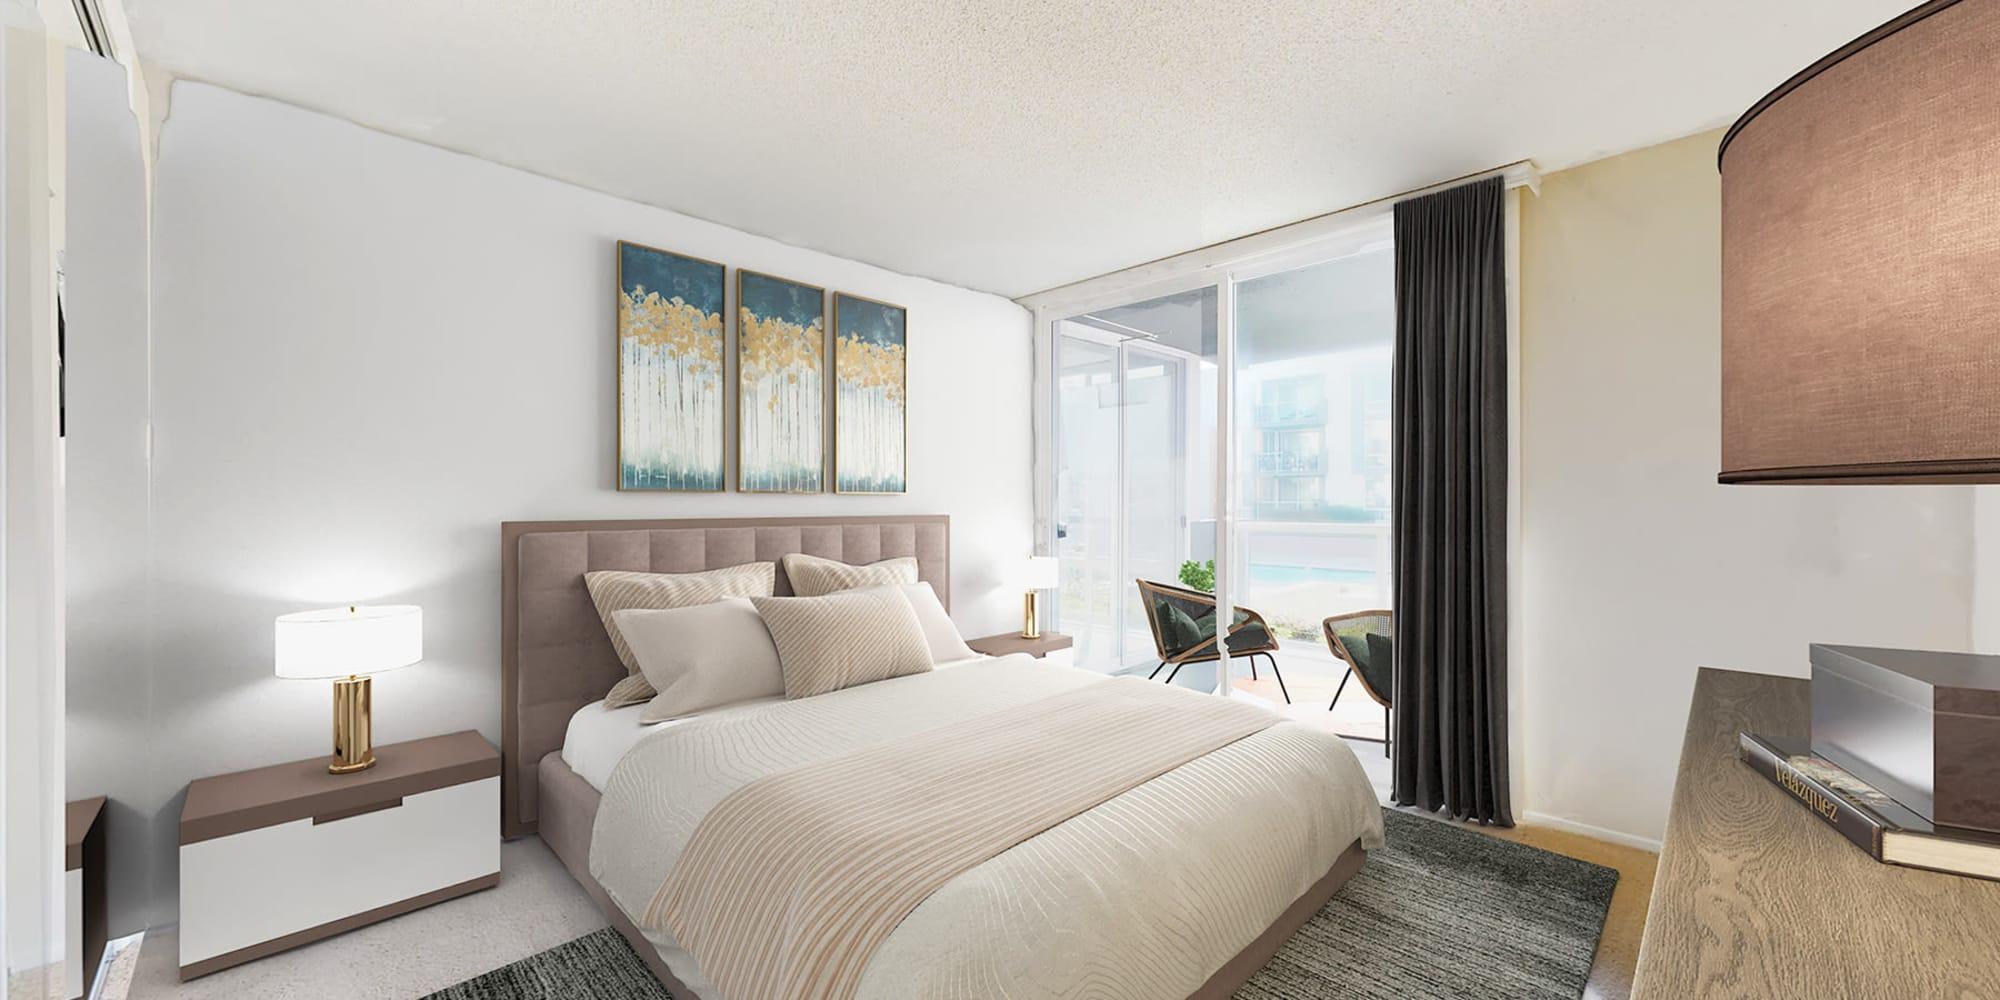 Spacious bedroom with plush carpet and balcony at Waters Edge at Marina Harbor in Marina Del Rey, California